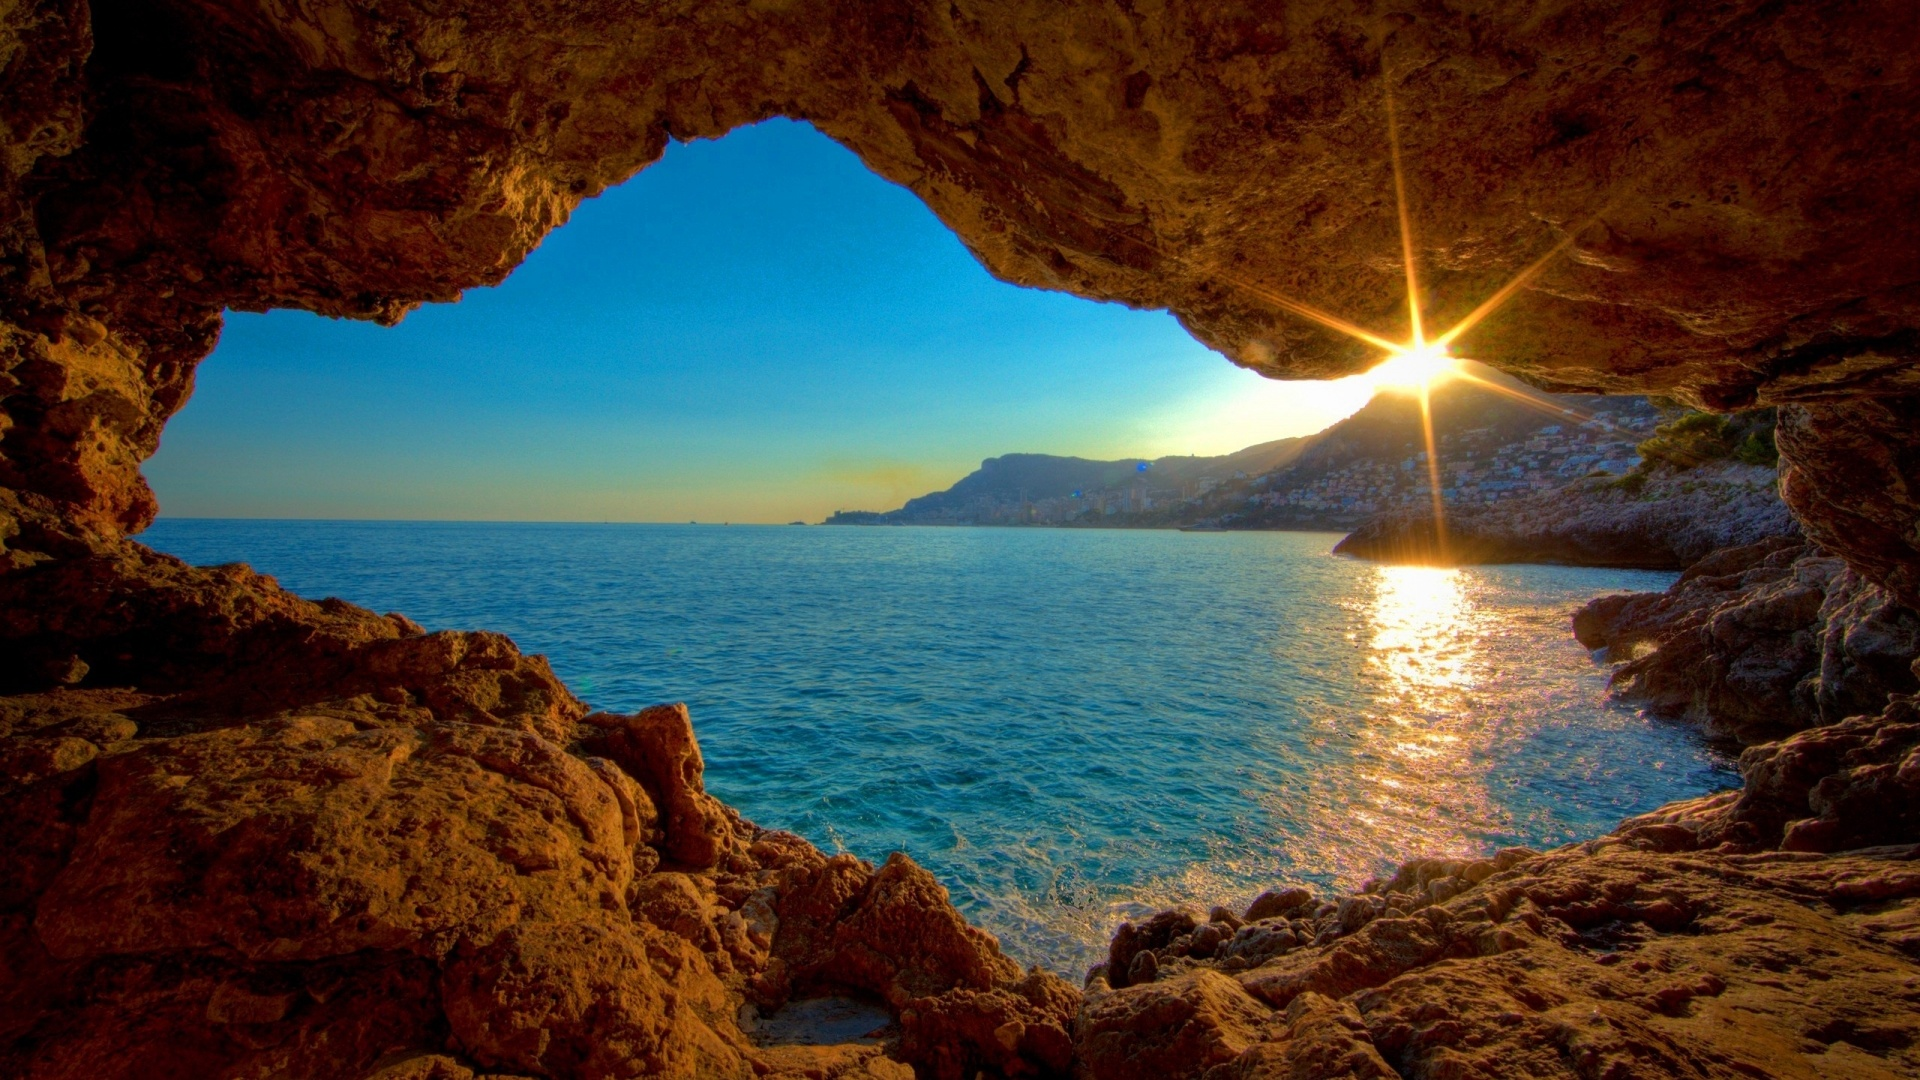 1920x1080 Sunrise Ocean Cave desktop PC and Mac wallpaper 1920x1080